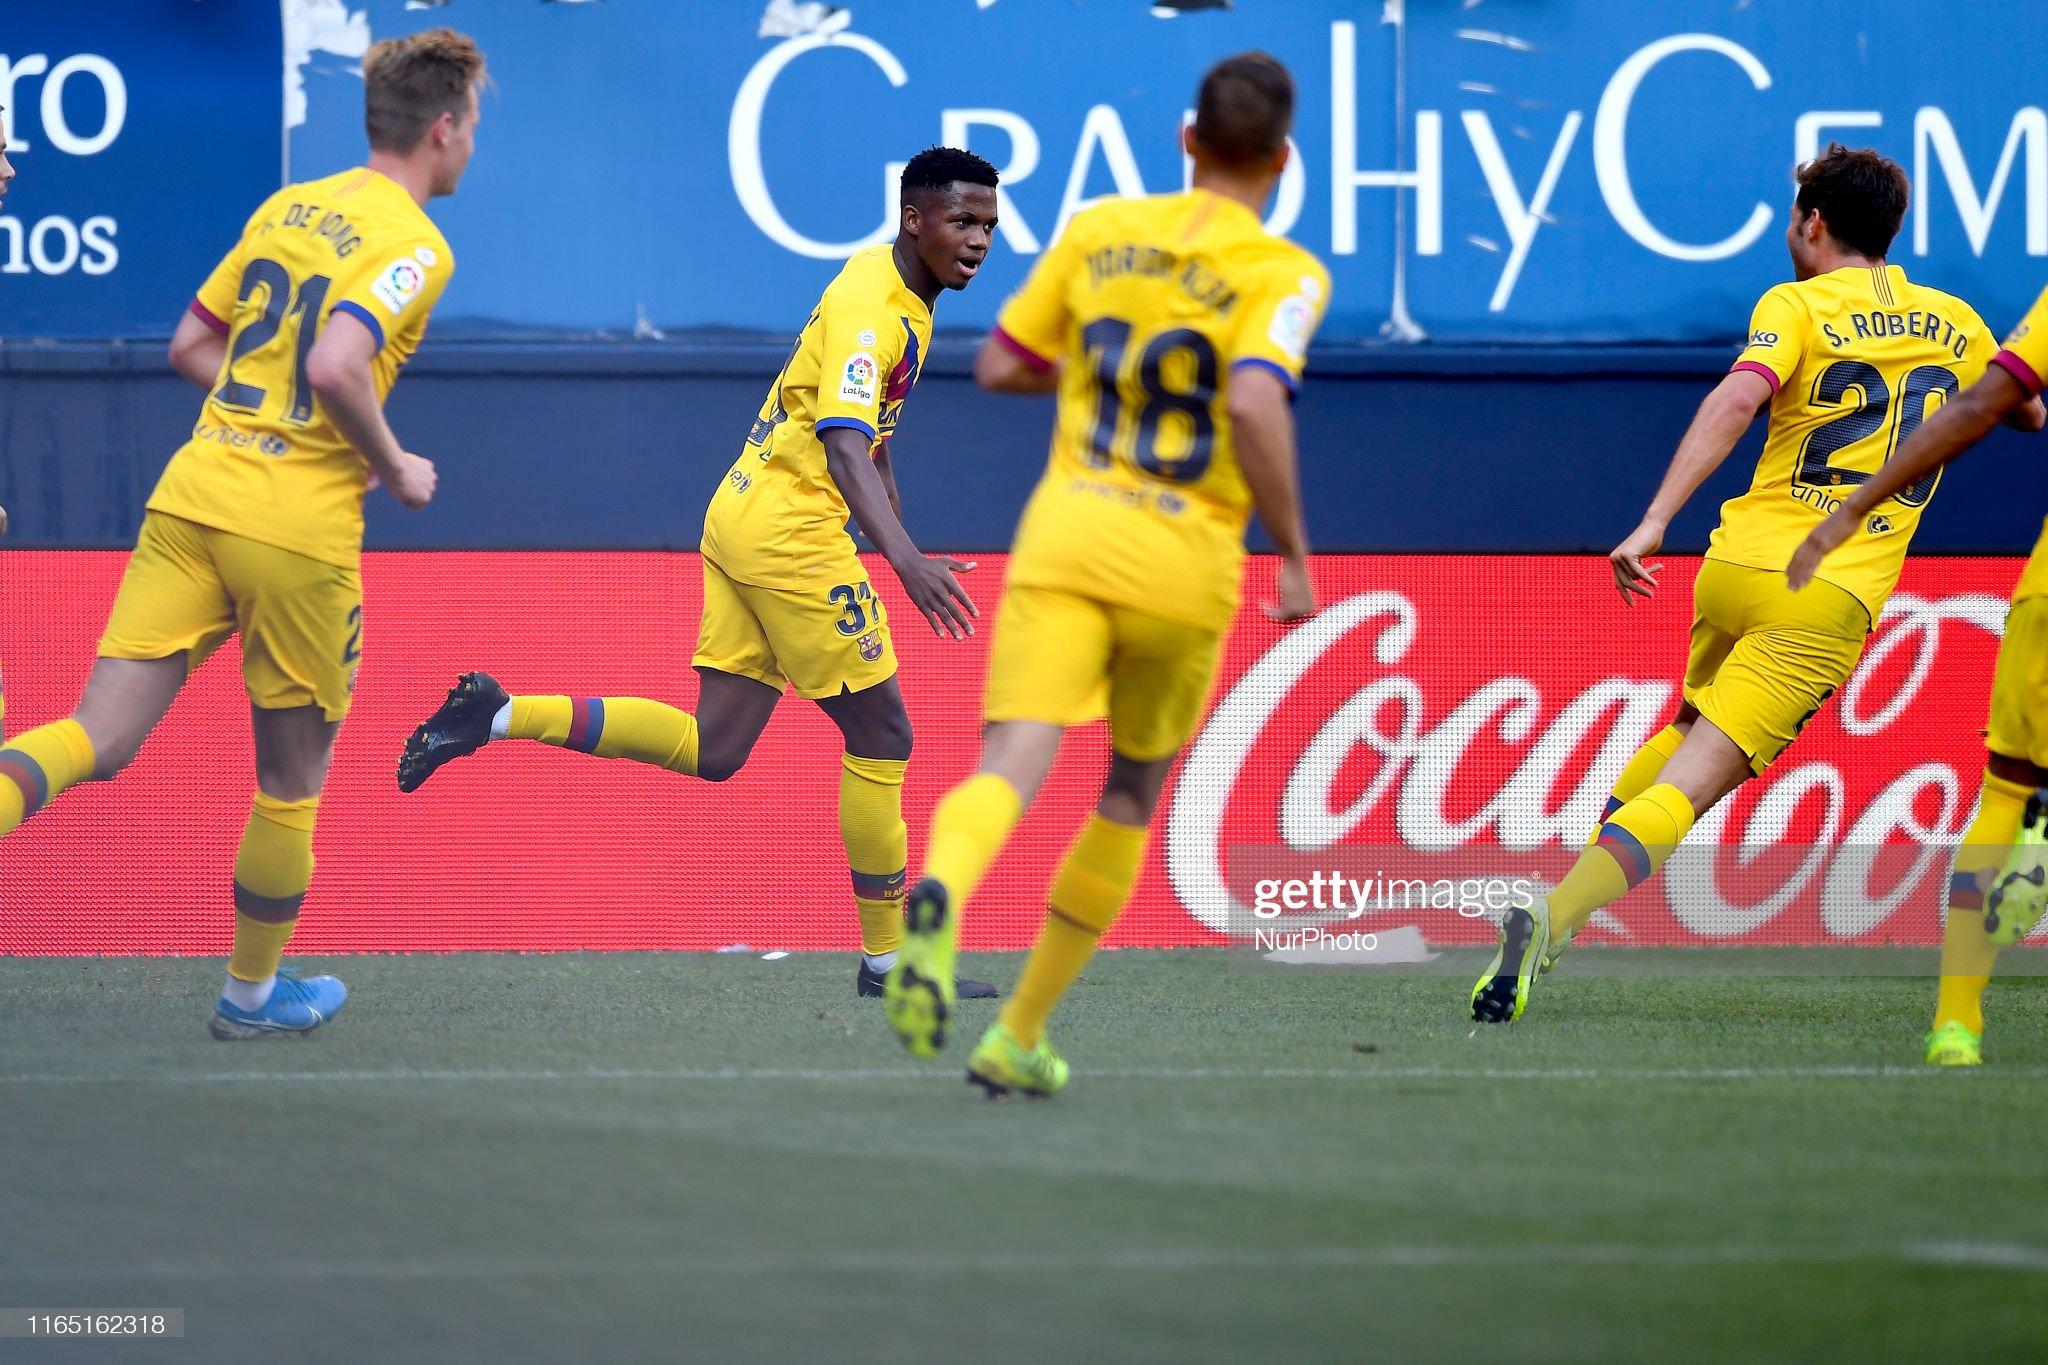 صور مباراة : أوساسونا - برشلونة 2-2 ( 31-08-2019 )  Ansu-fati-of-barcelona-celebrates-after-scoring-his-sides-first-goal-picture-id1165162318?s=2048x2048